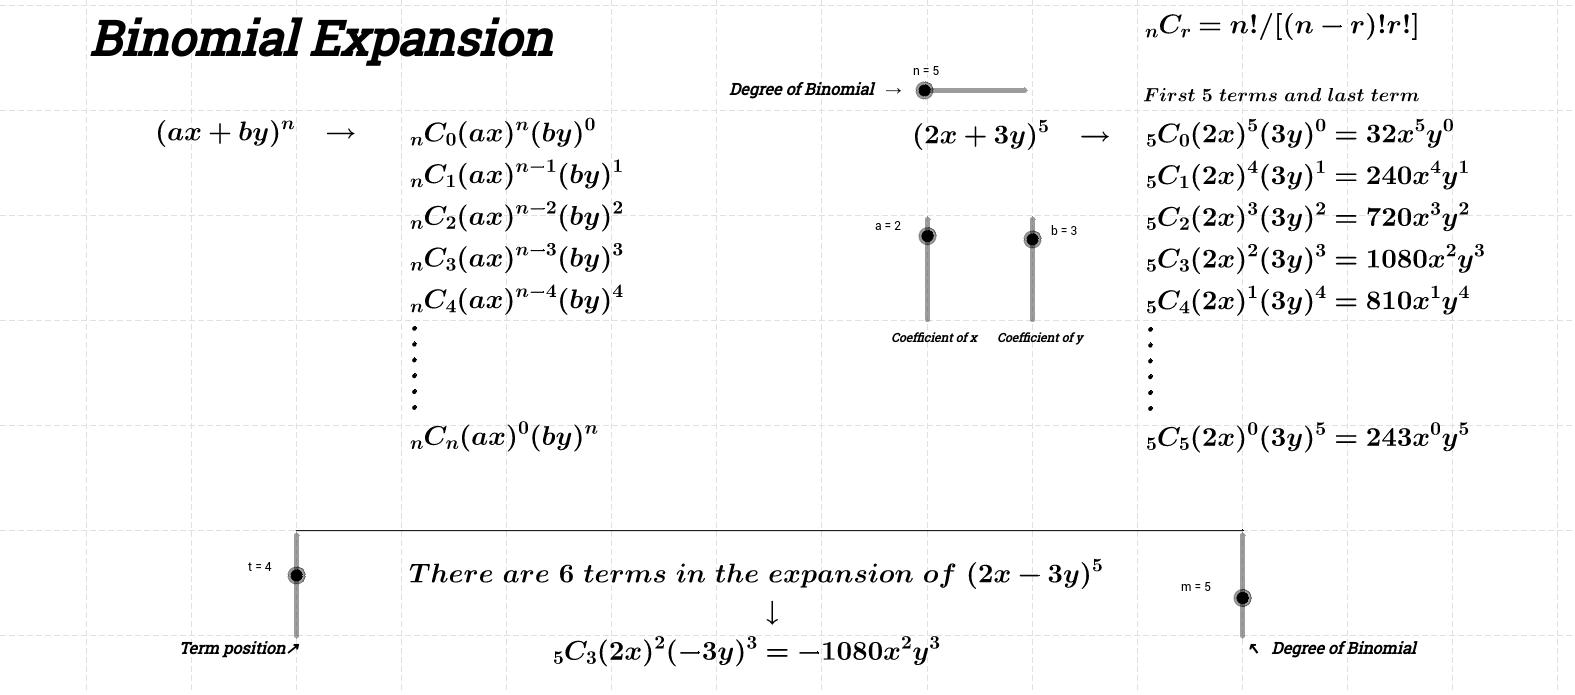 binomial expansion worksheet worksheets for school mindgearlabs. Black Bedroom Furniture Sets. Home Design Ideas